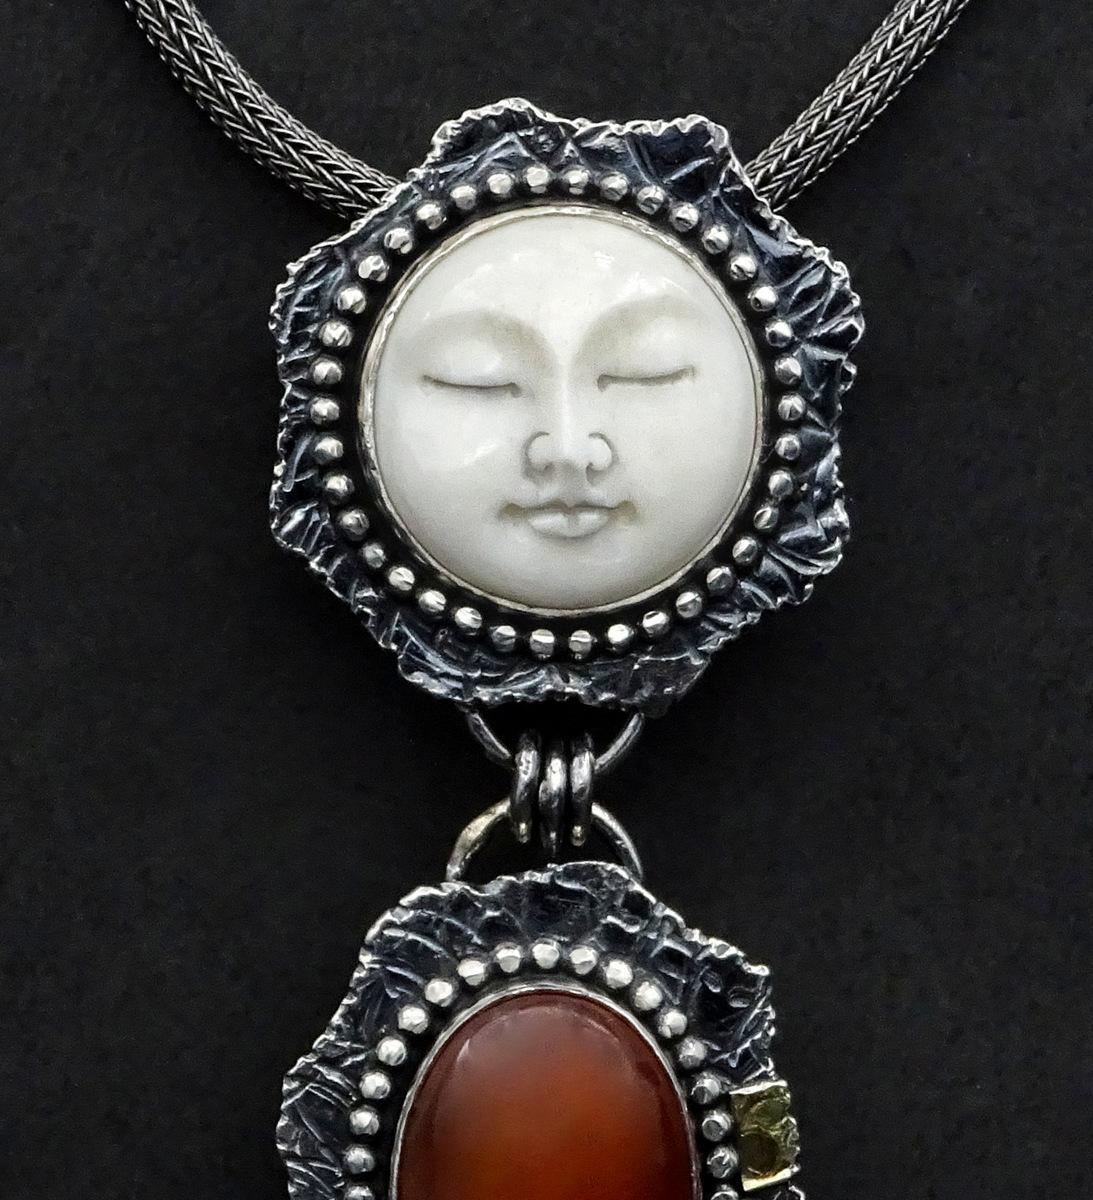 2-Handcrafted Silver& Stone Pendant, Sylvia McCollum, Asheville, NC-001.JPG